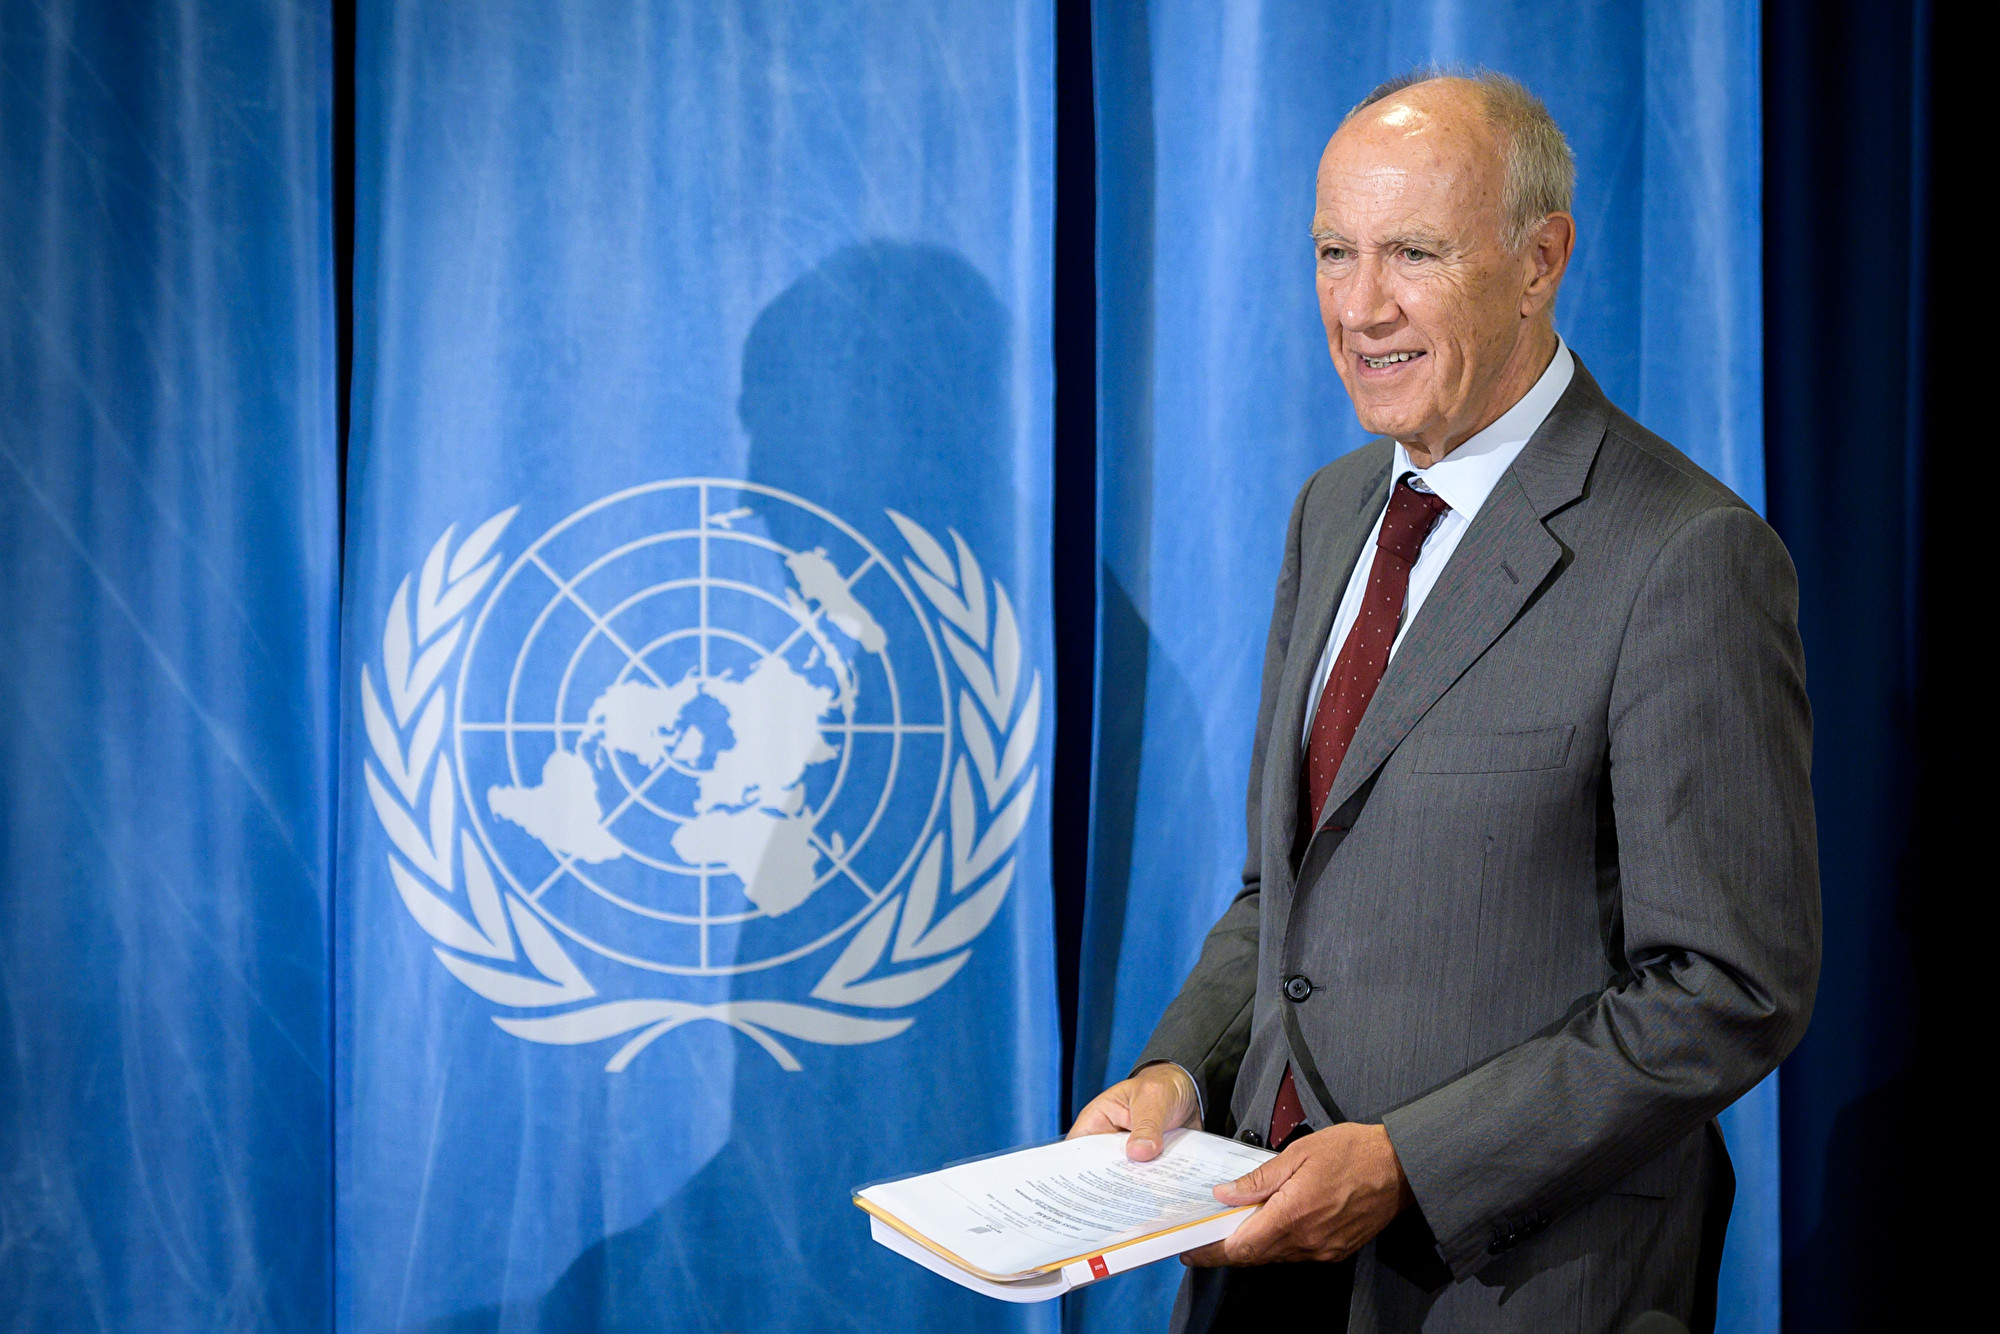 WIPO總幹事改選在即 美力阻中共候選人當選